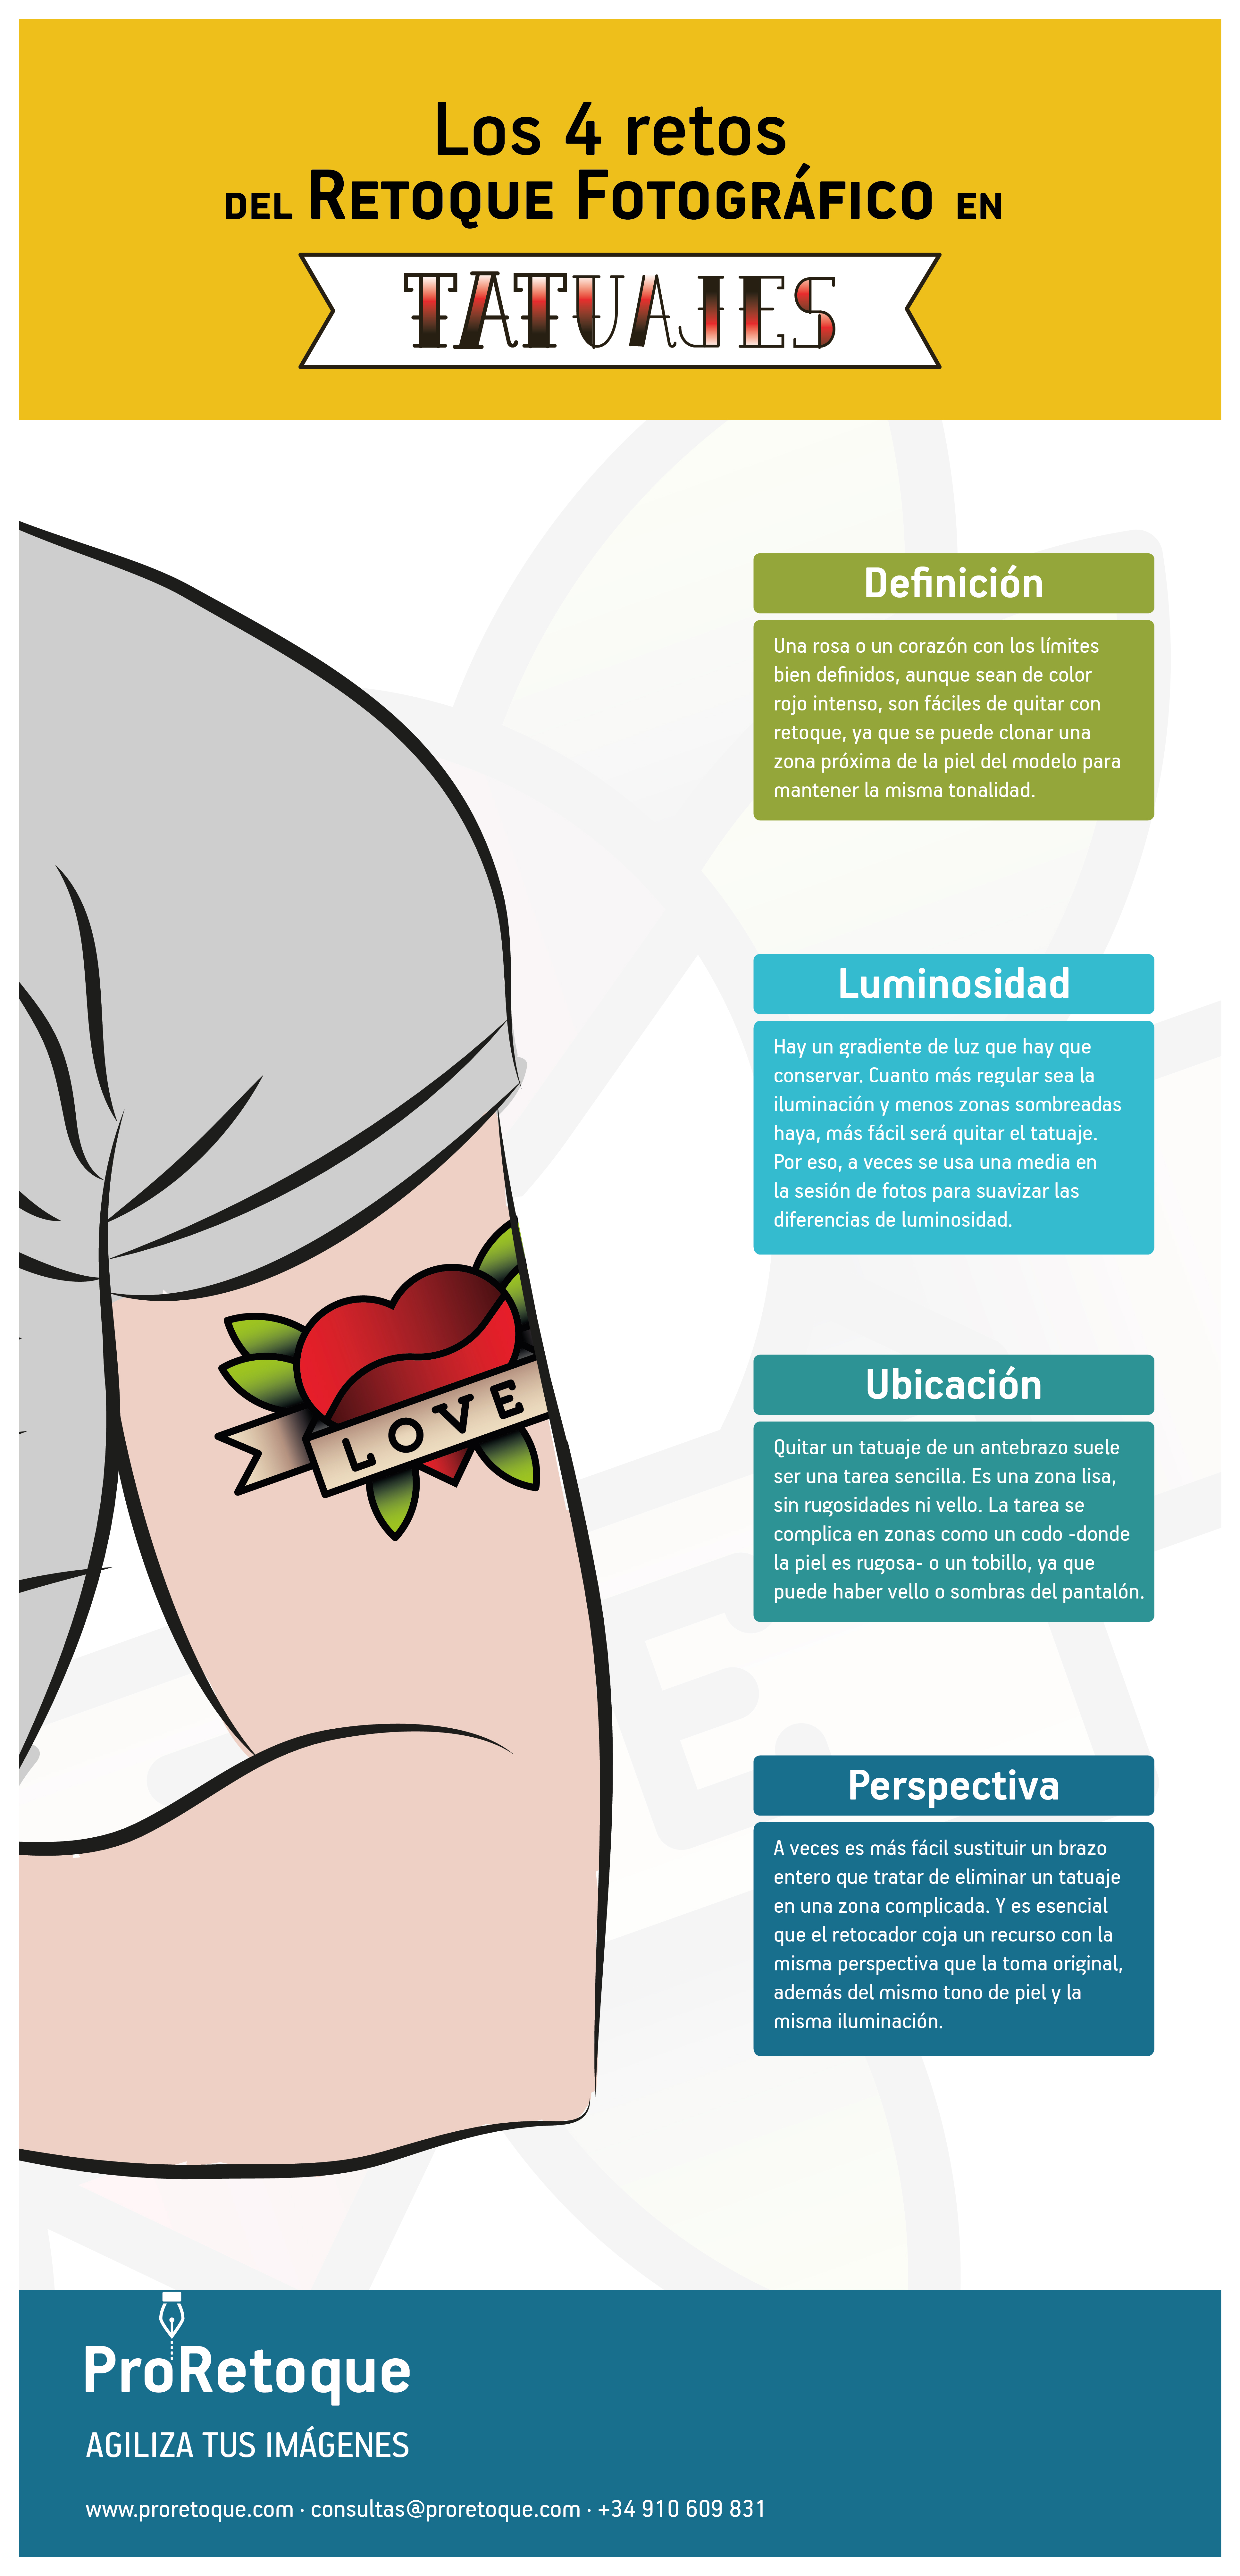 retoque fotográfico en tatuajes